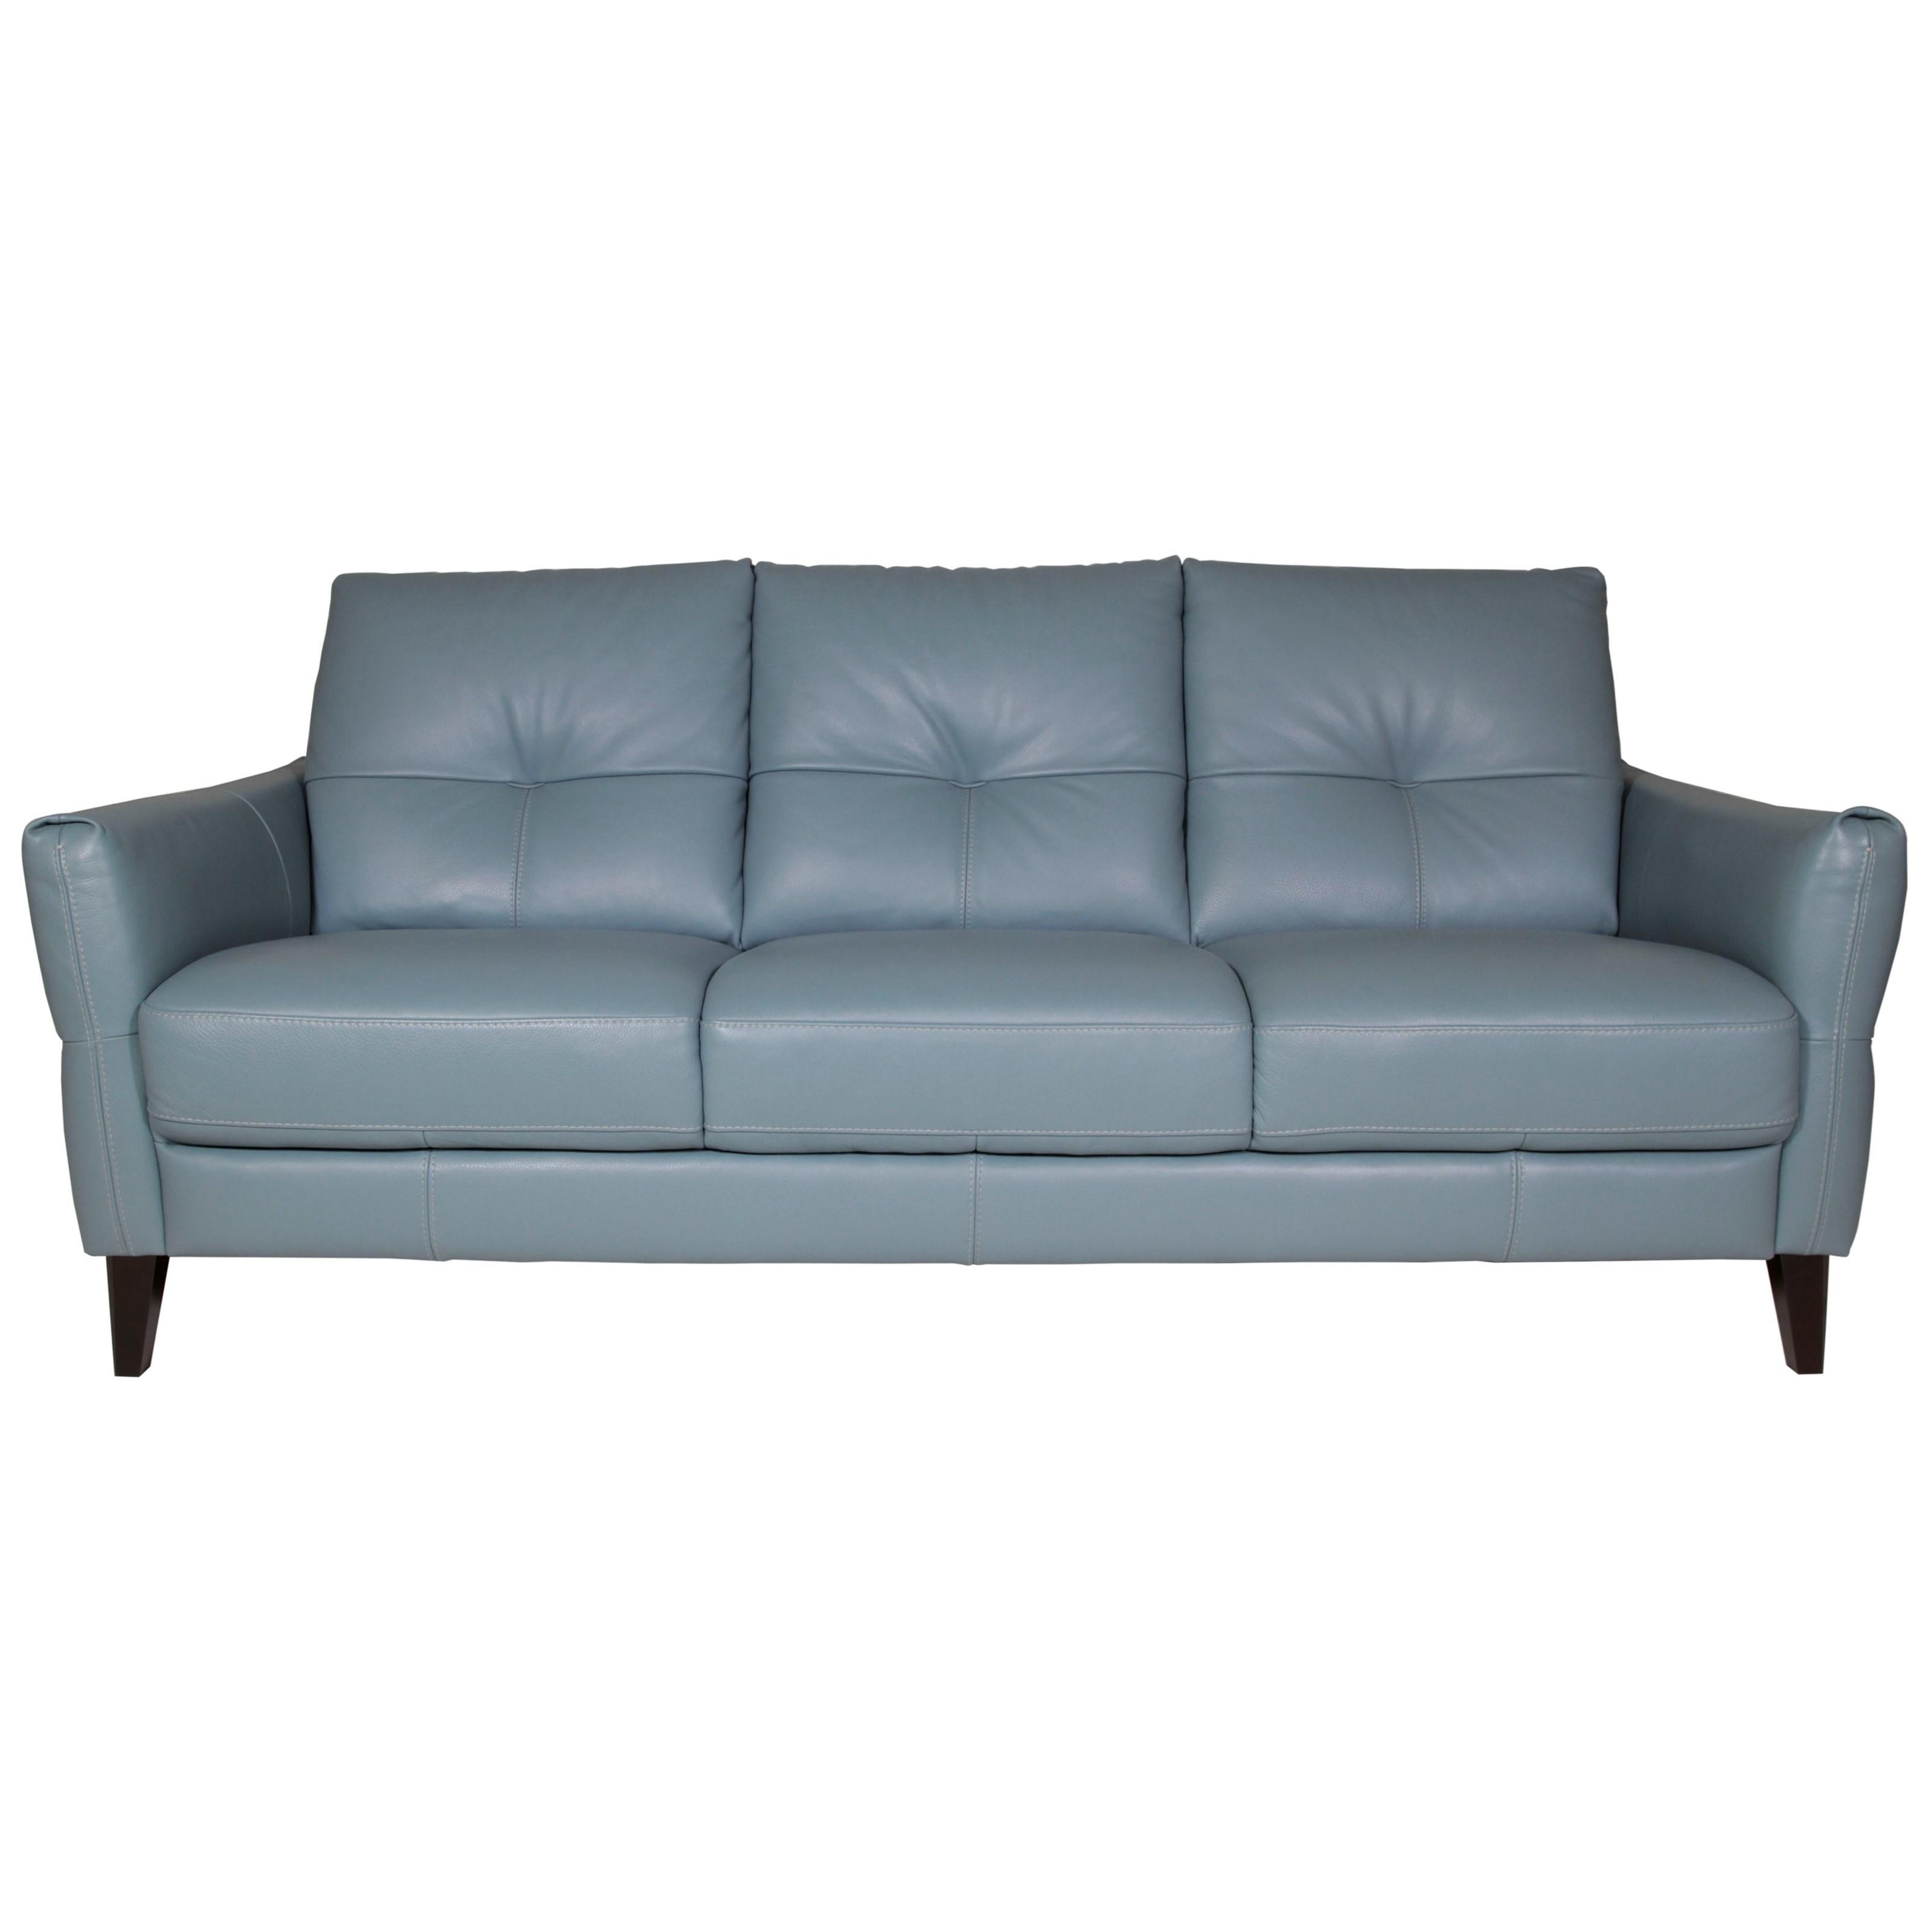 Leale Sofa by Natuzzi Editions at HomeWorld Furniture